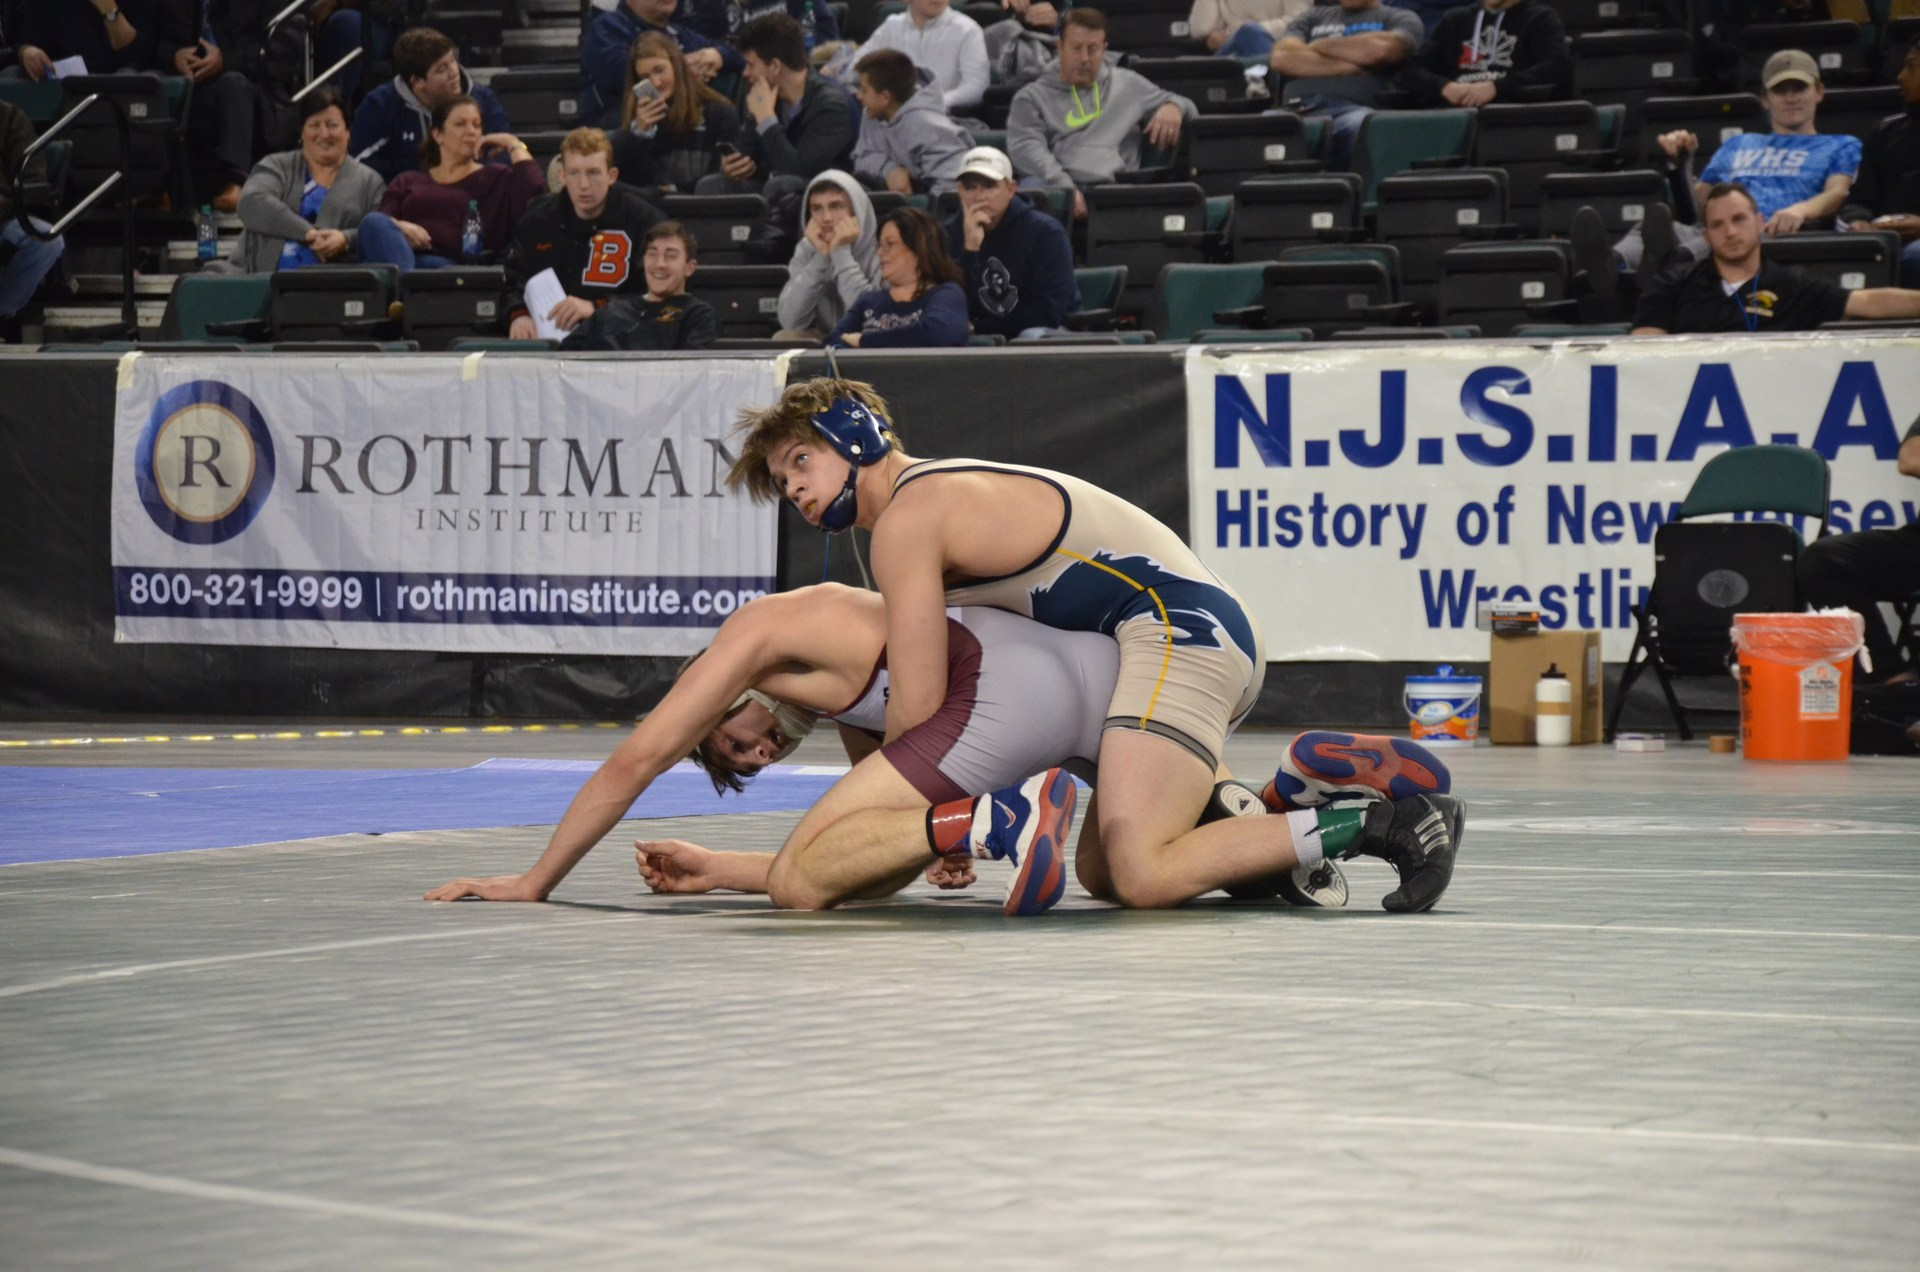 PJ wrestling Aragona